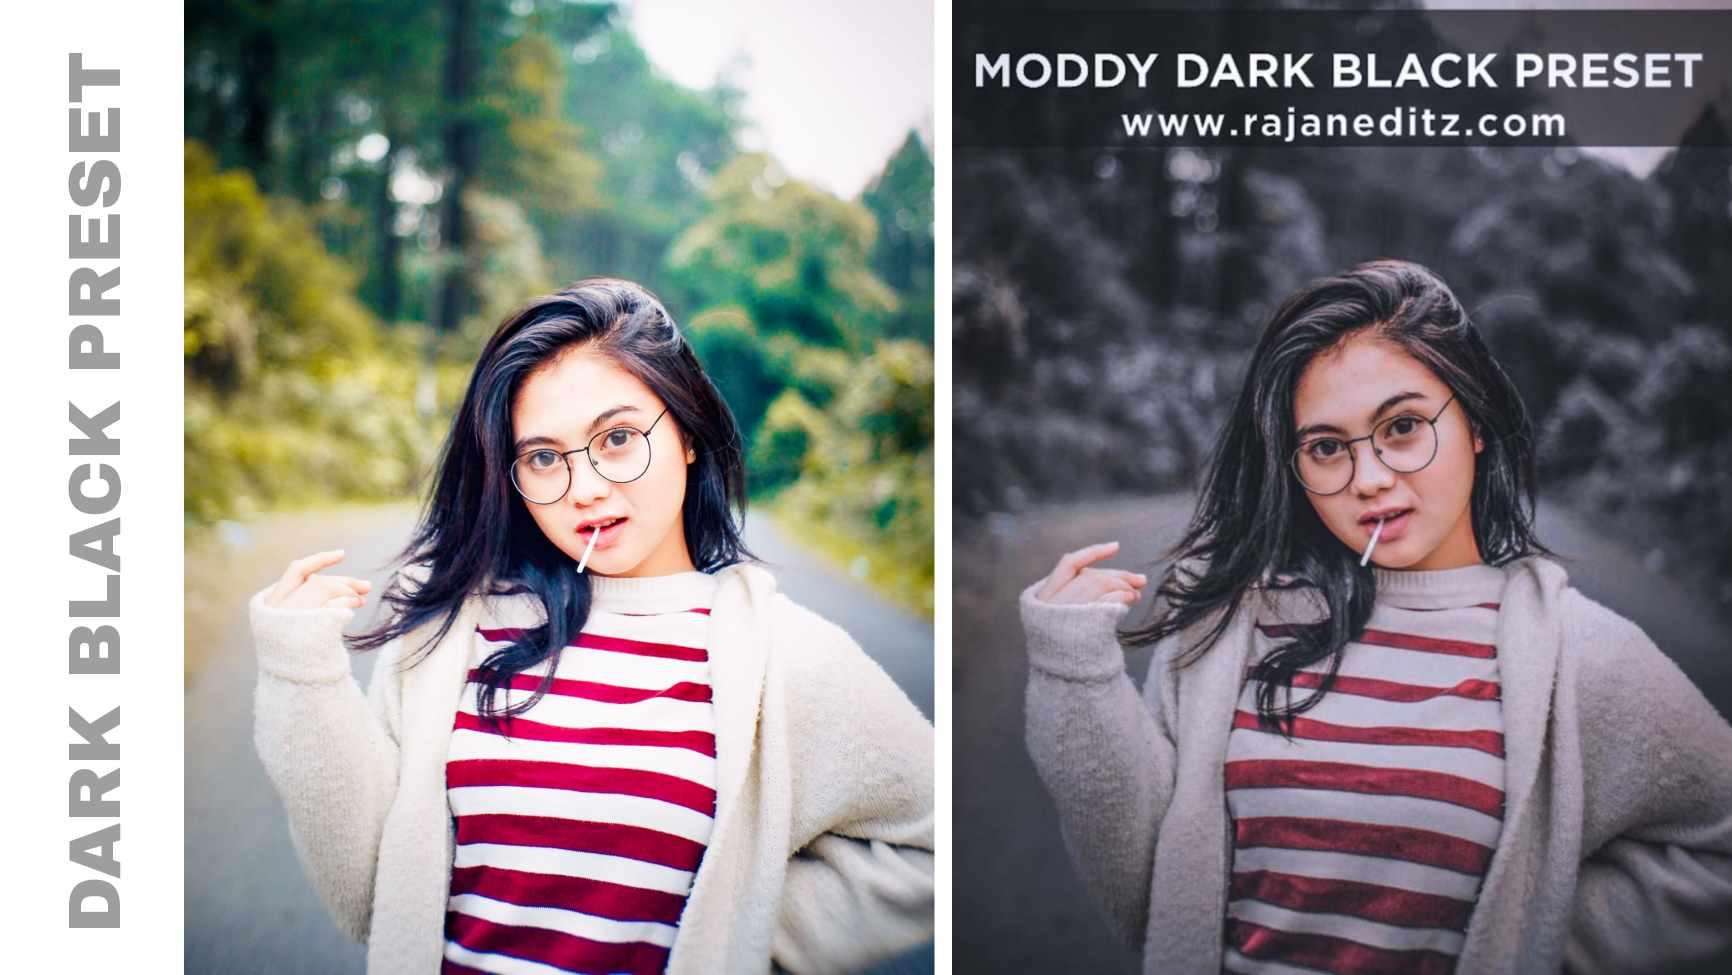 Moddy dark black preset_moddy dark preset_moddy black preset